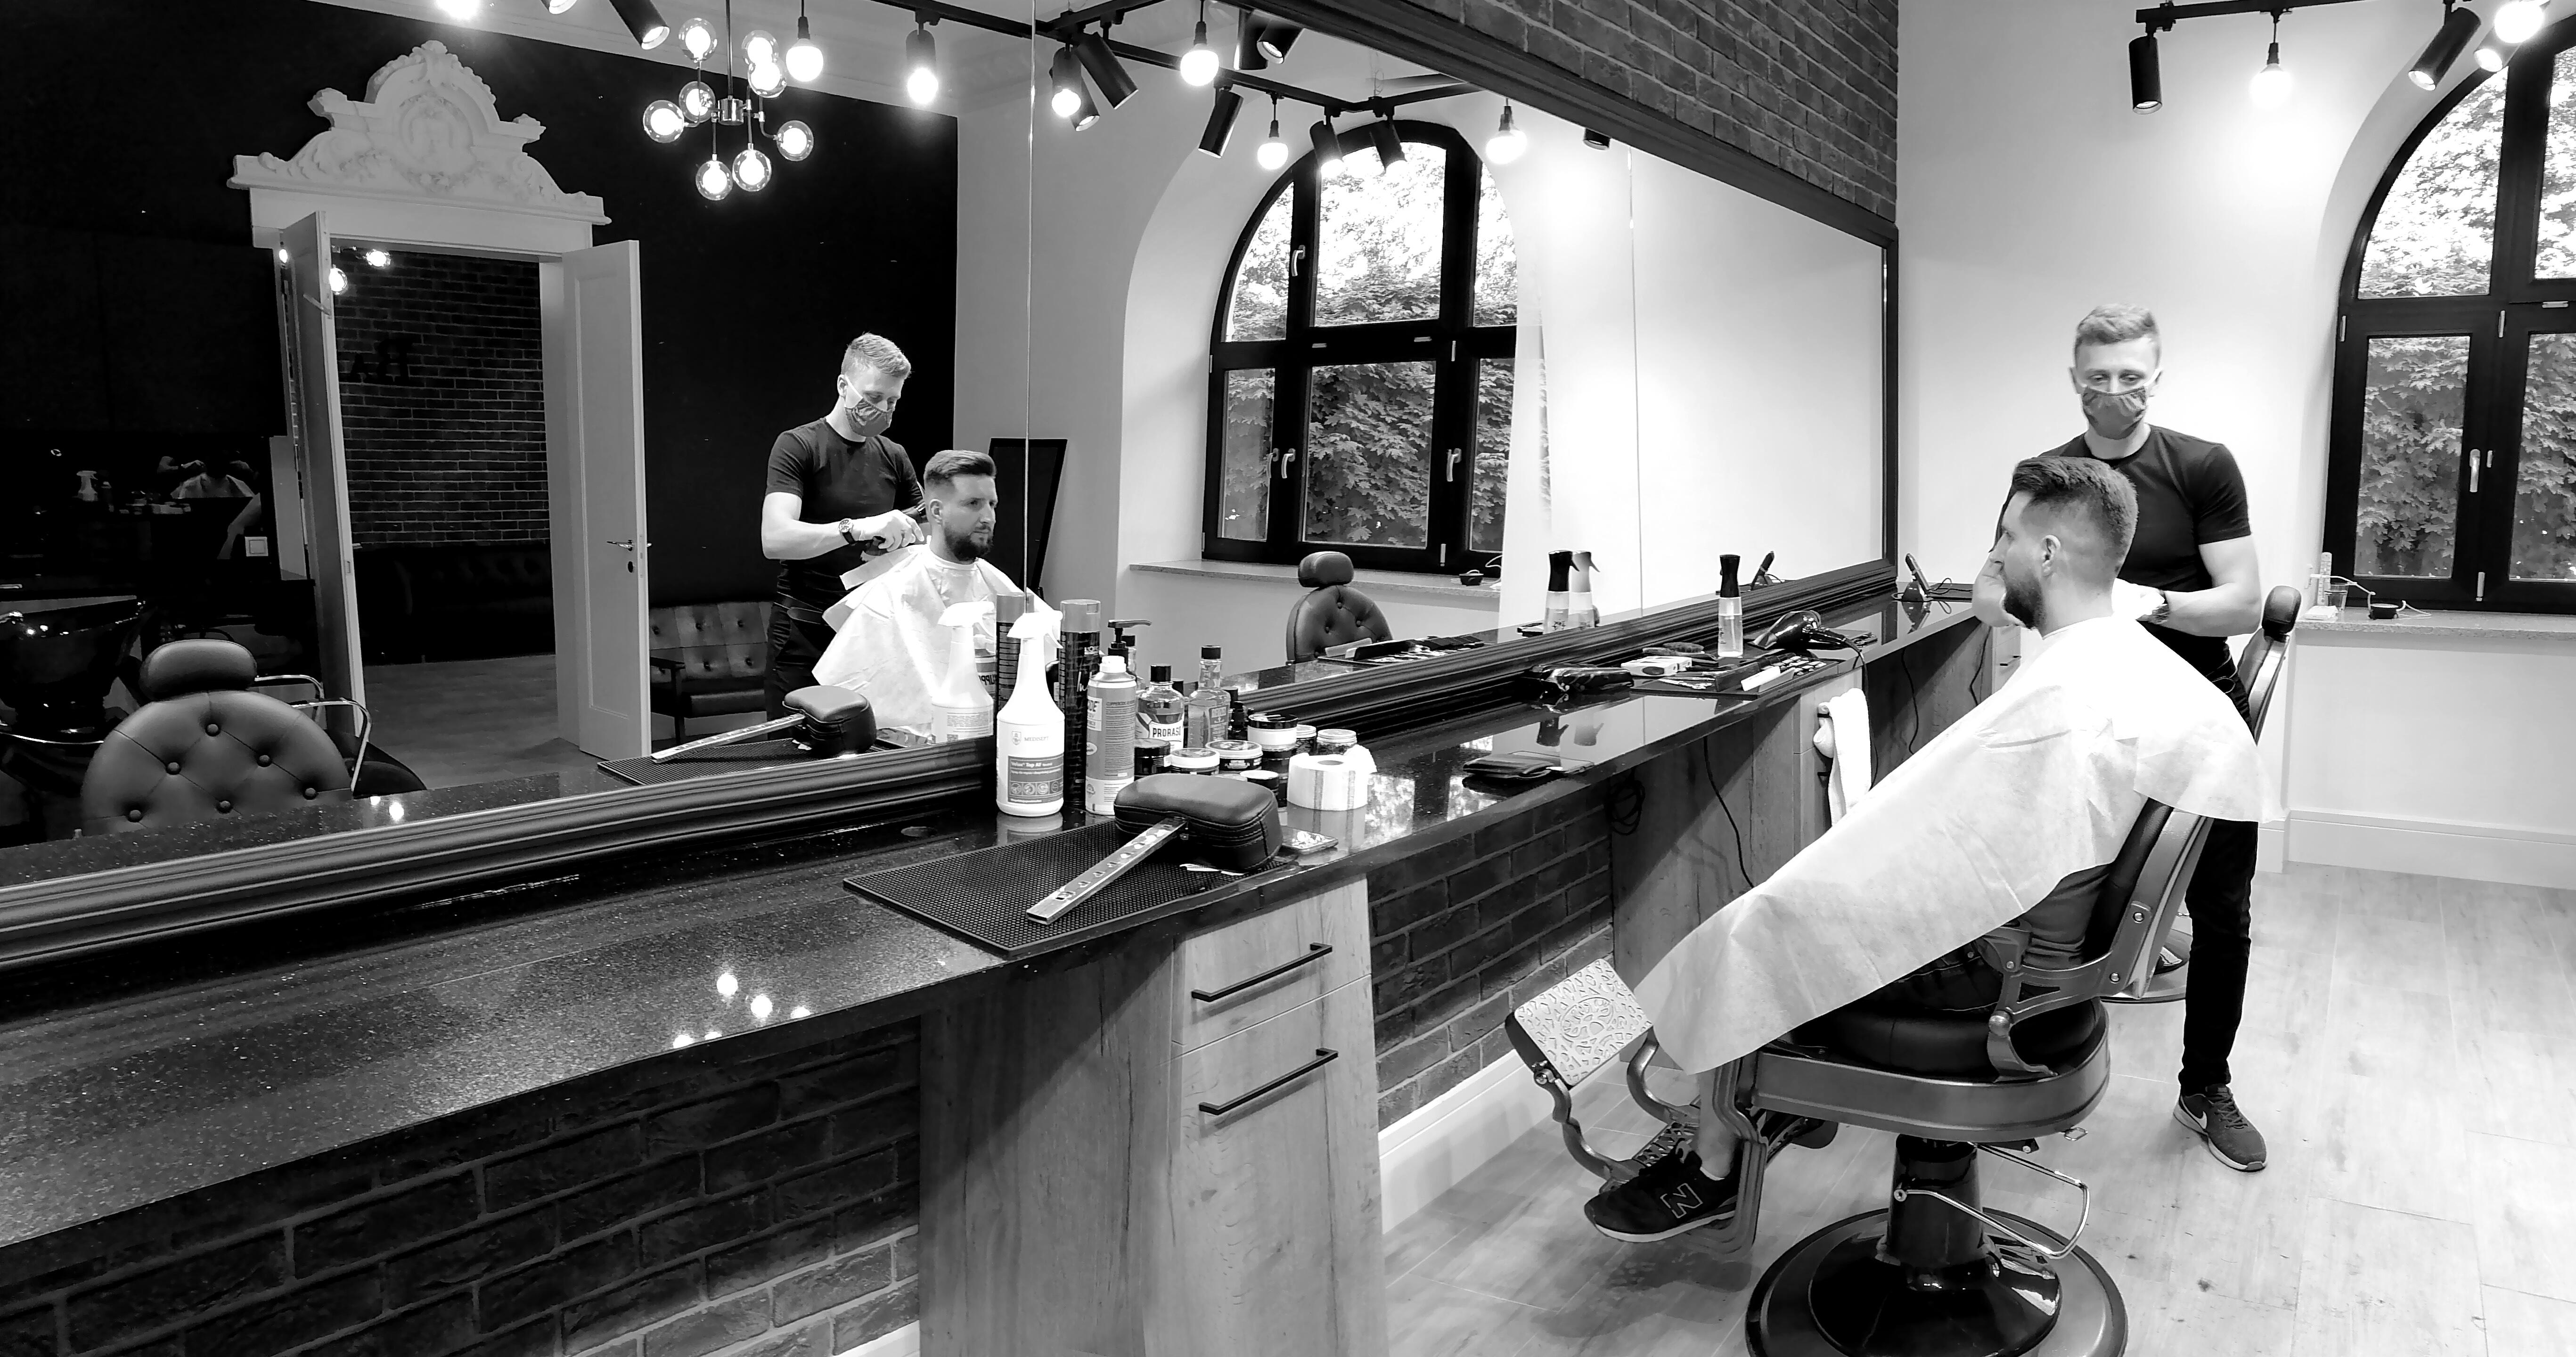 Barberzy_3